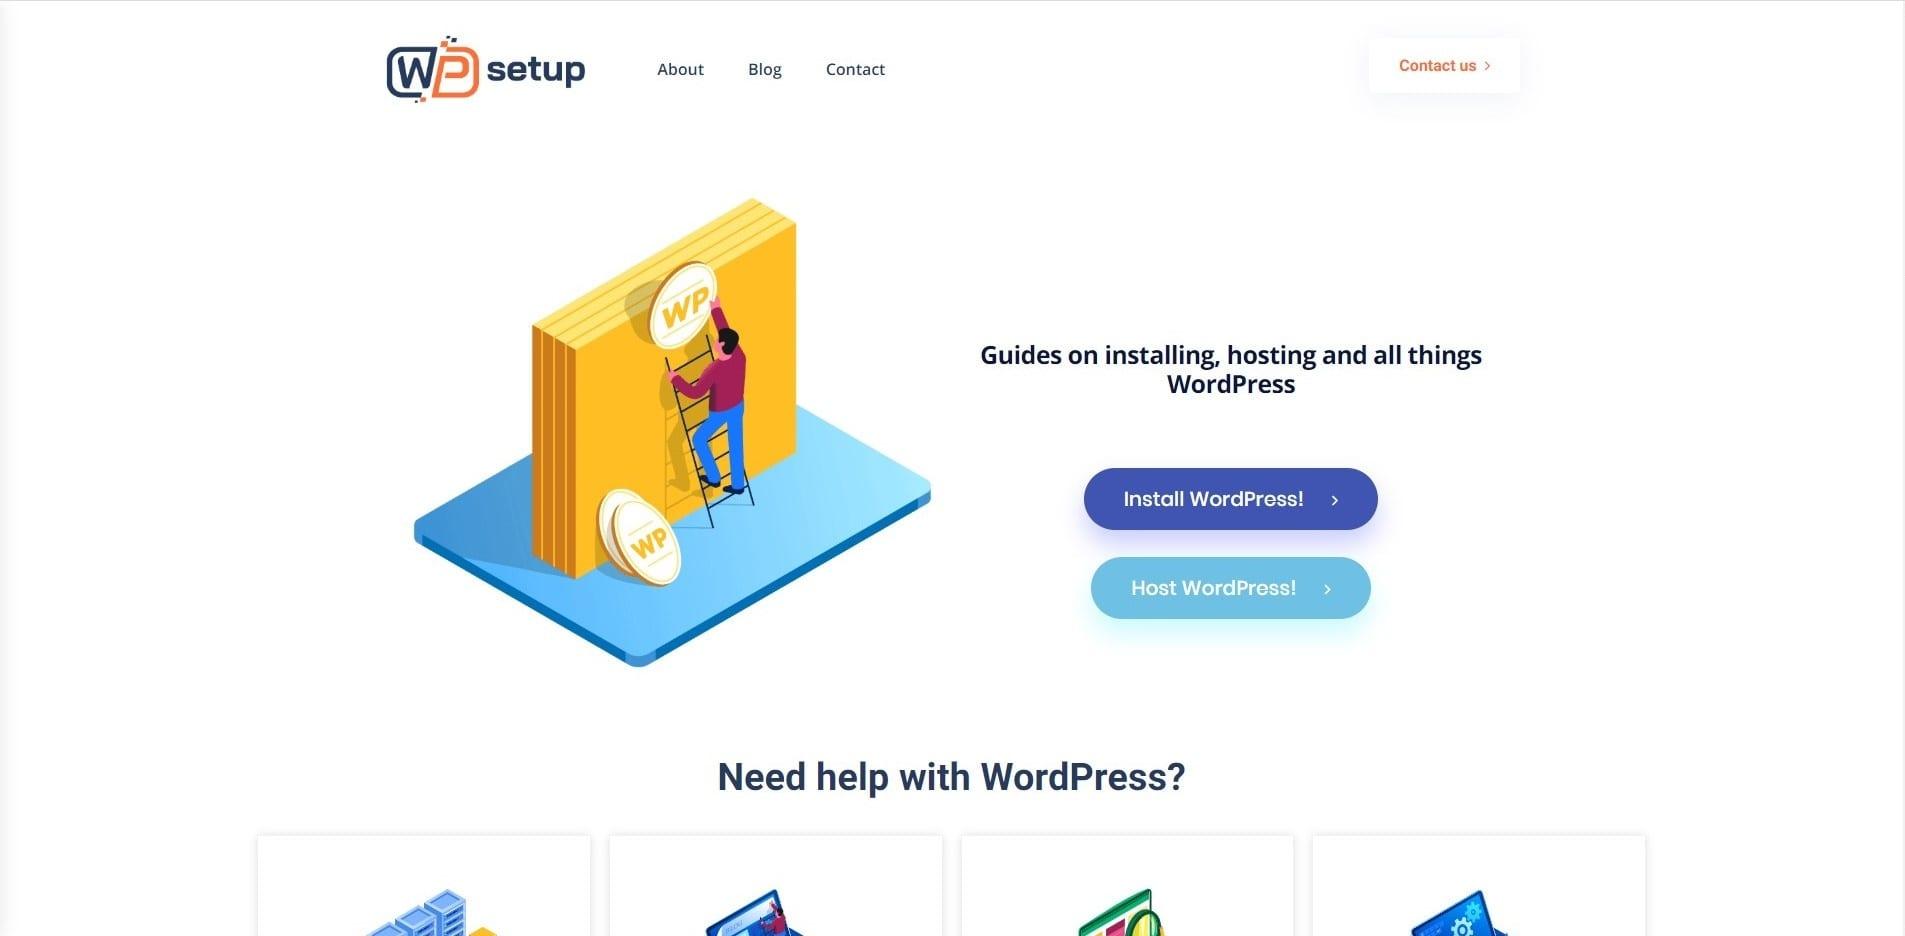 Learn WordPress with WP setup